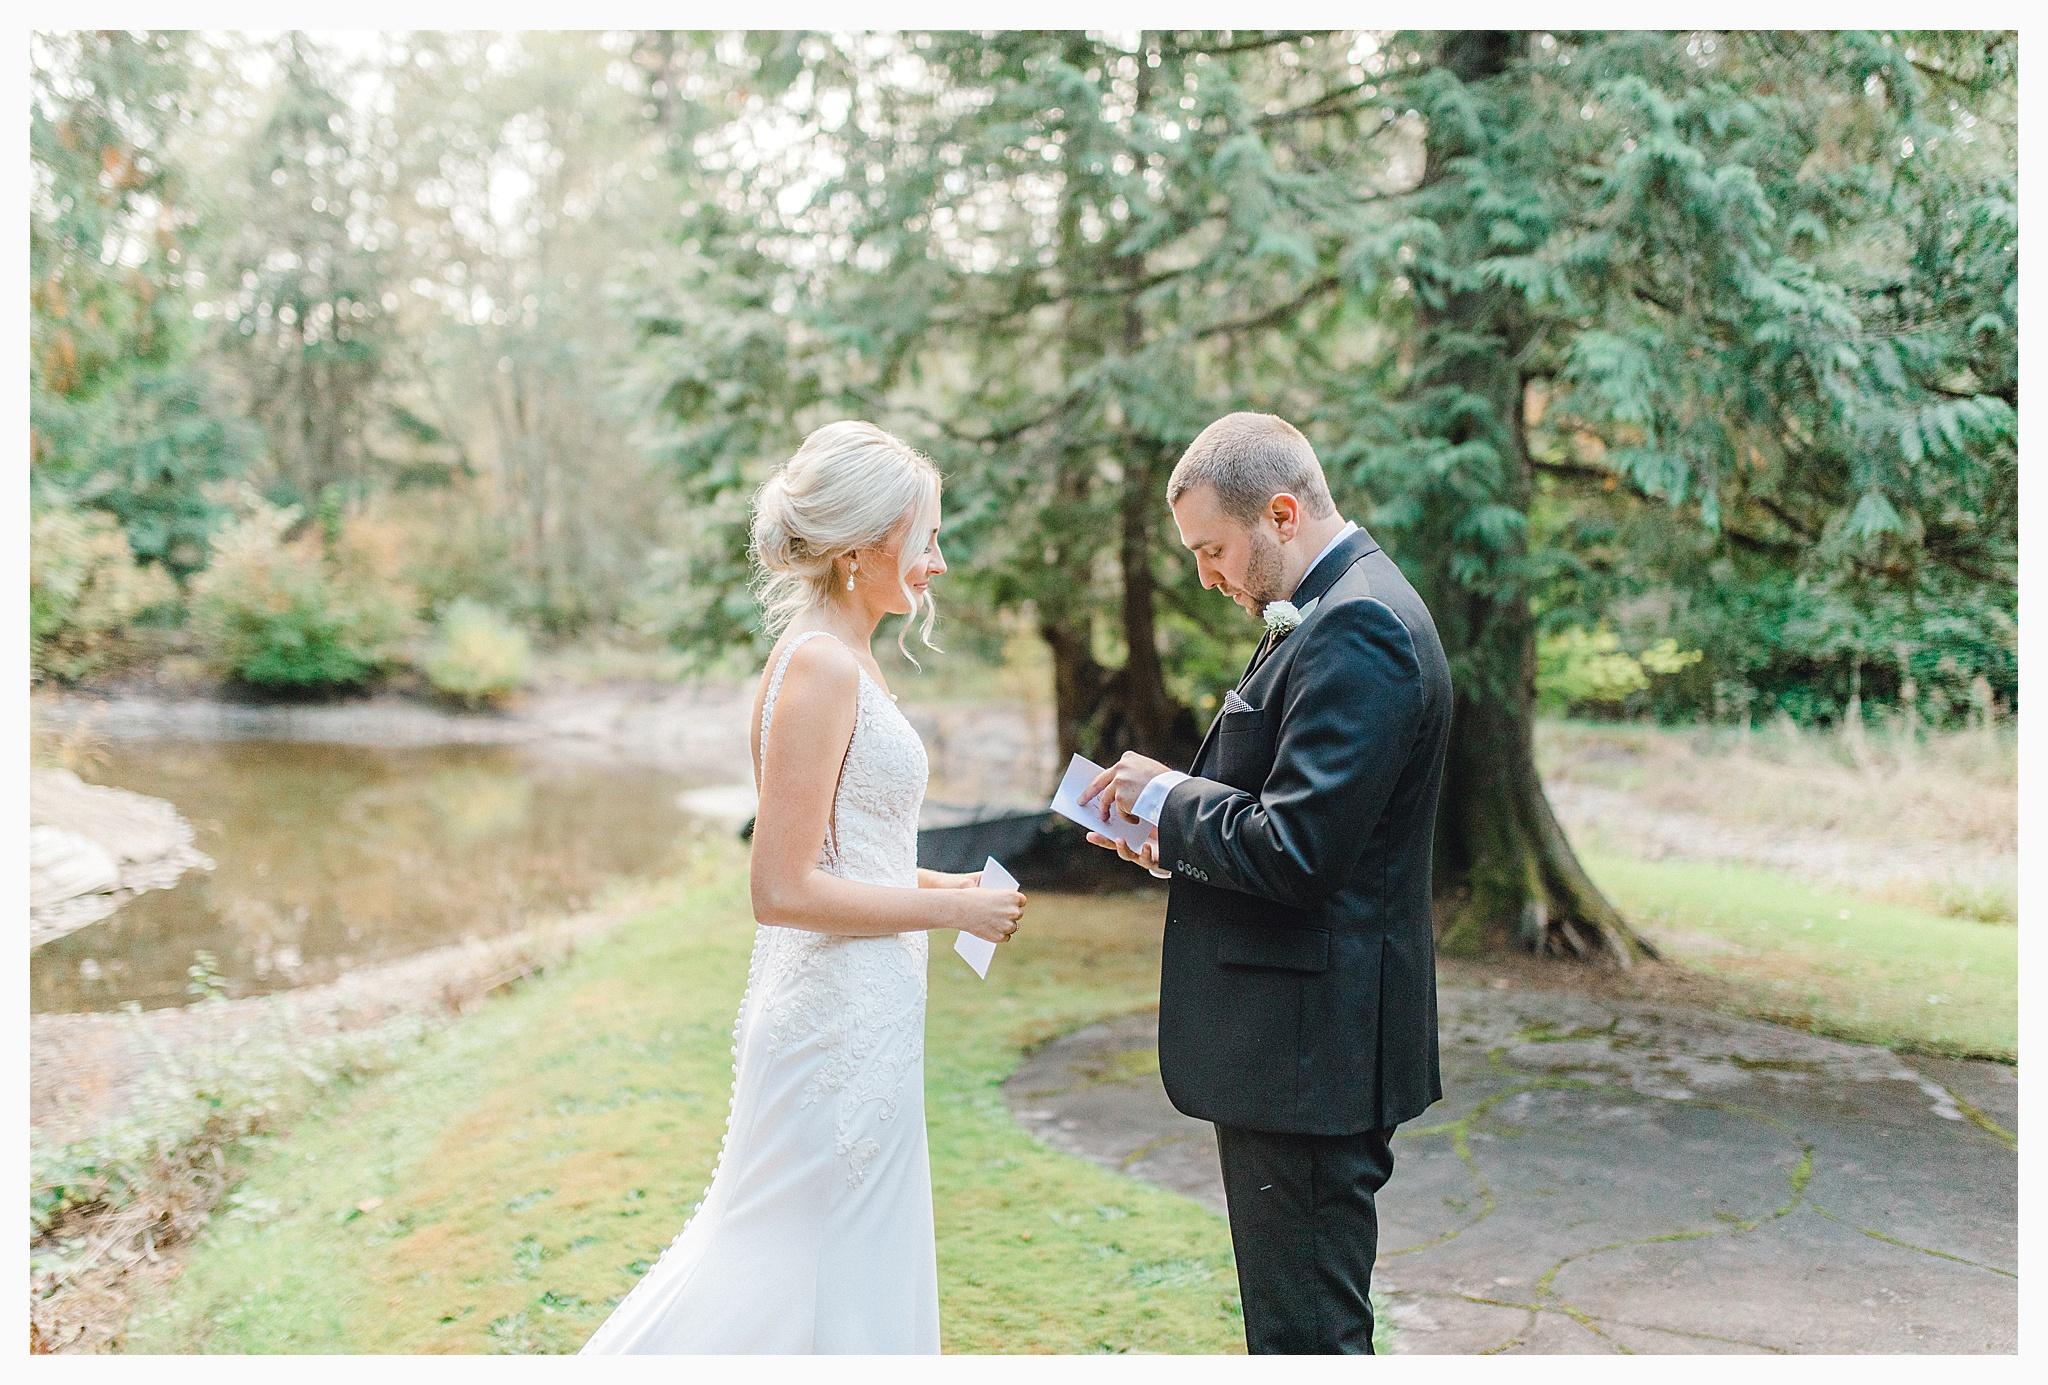 Emma Rose Company Light and Airy Wedding Photographer, Beautiful fall wedding at Rock Creek Gardens Venue in Puyallup, Washington._0029.jpg